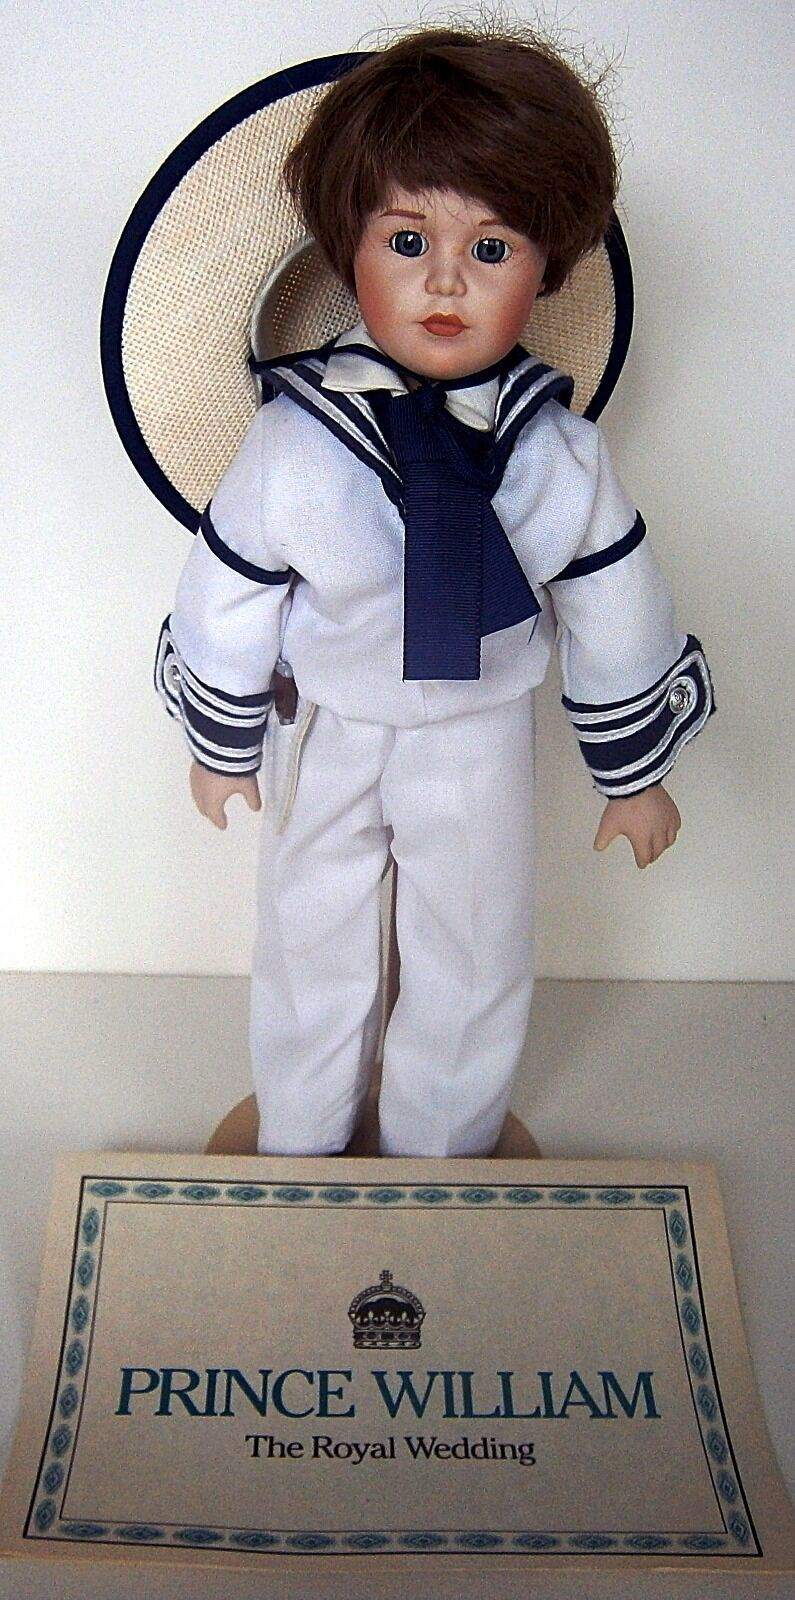 Prince William The Royal Wedding Doll by Danbury Mint